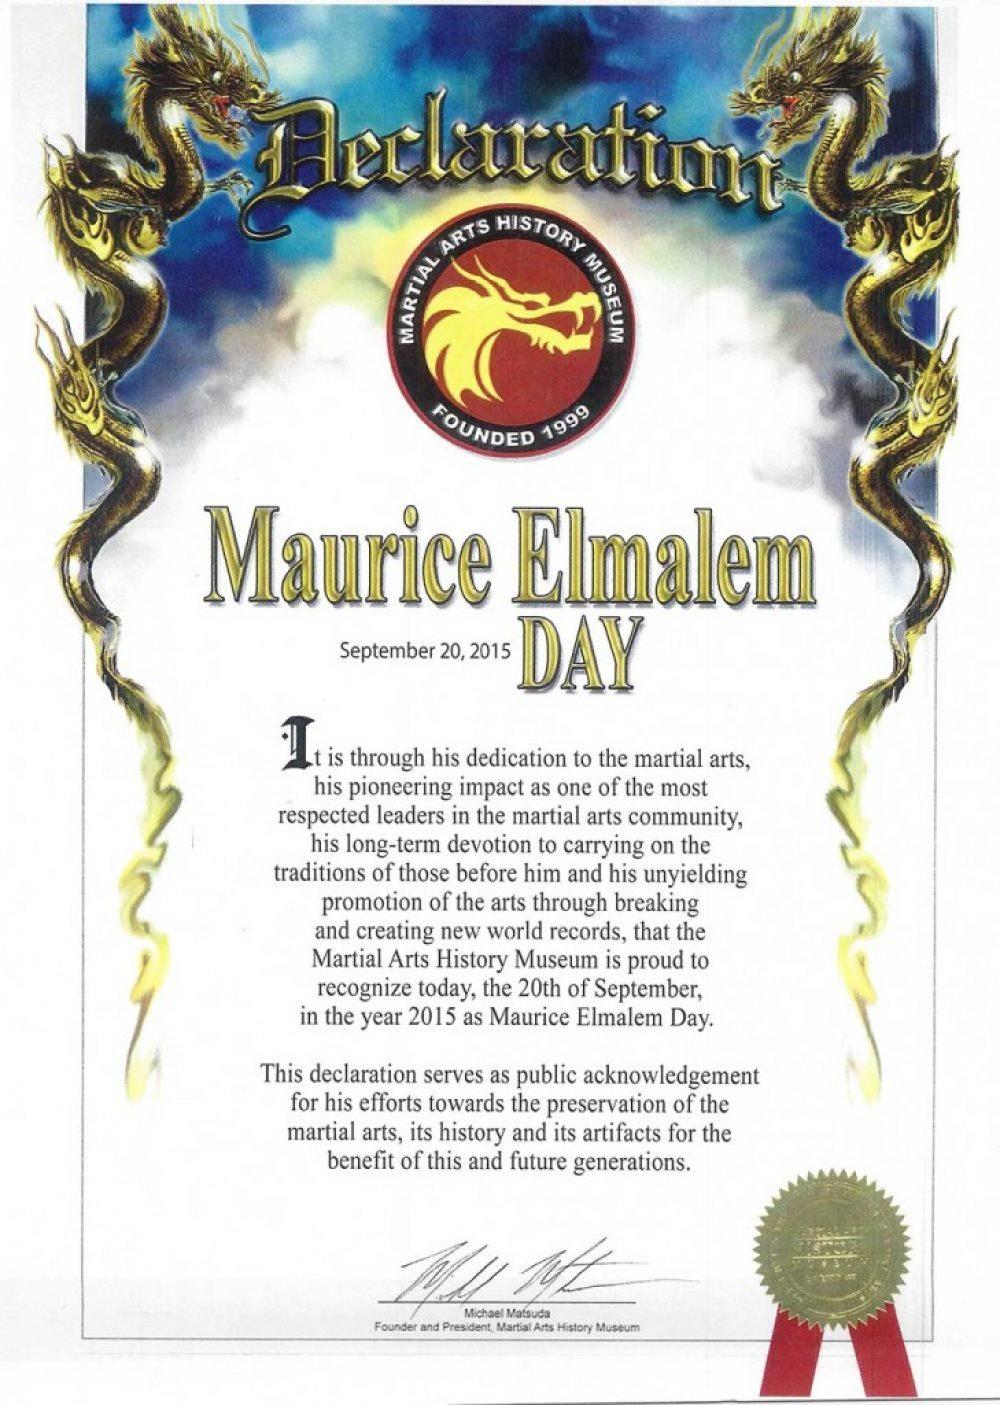 Maurice Elmalem Day